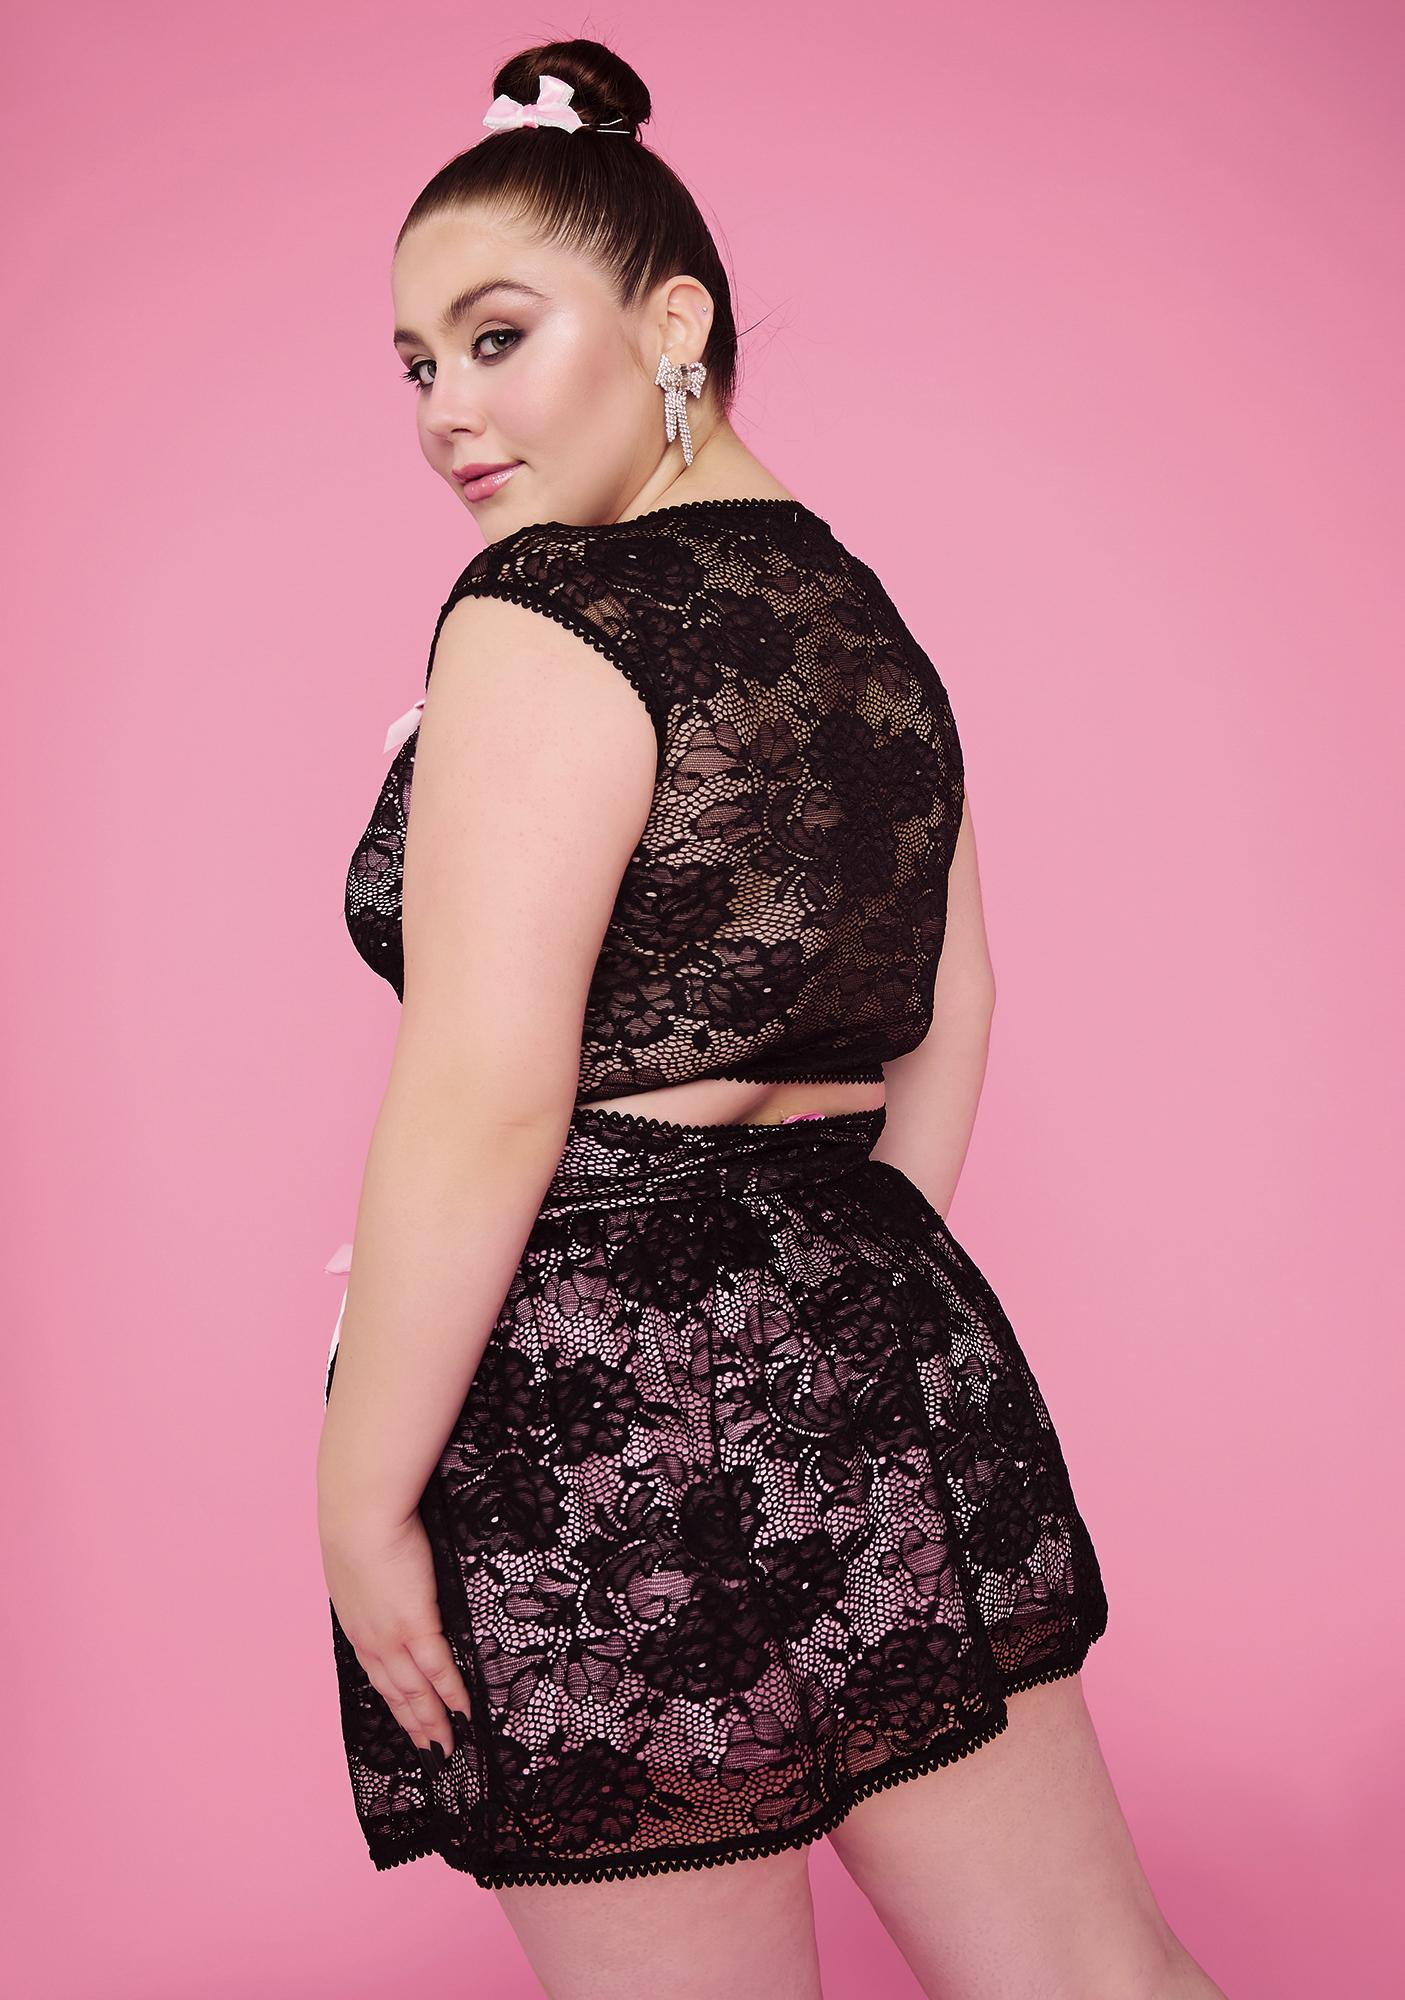 Sugar Thrillz Glam Grace In Lace Satin Bow Mini Skirt